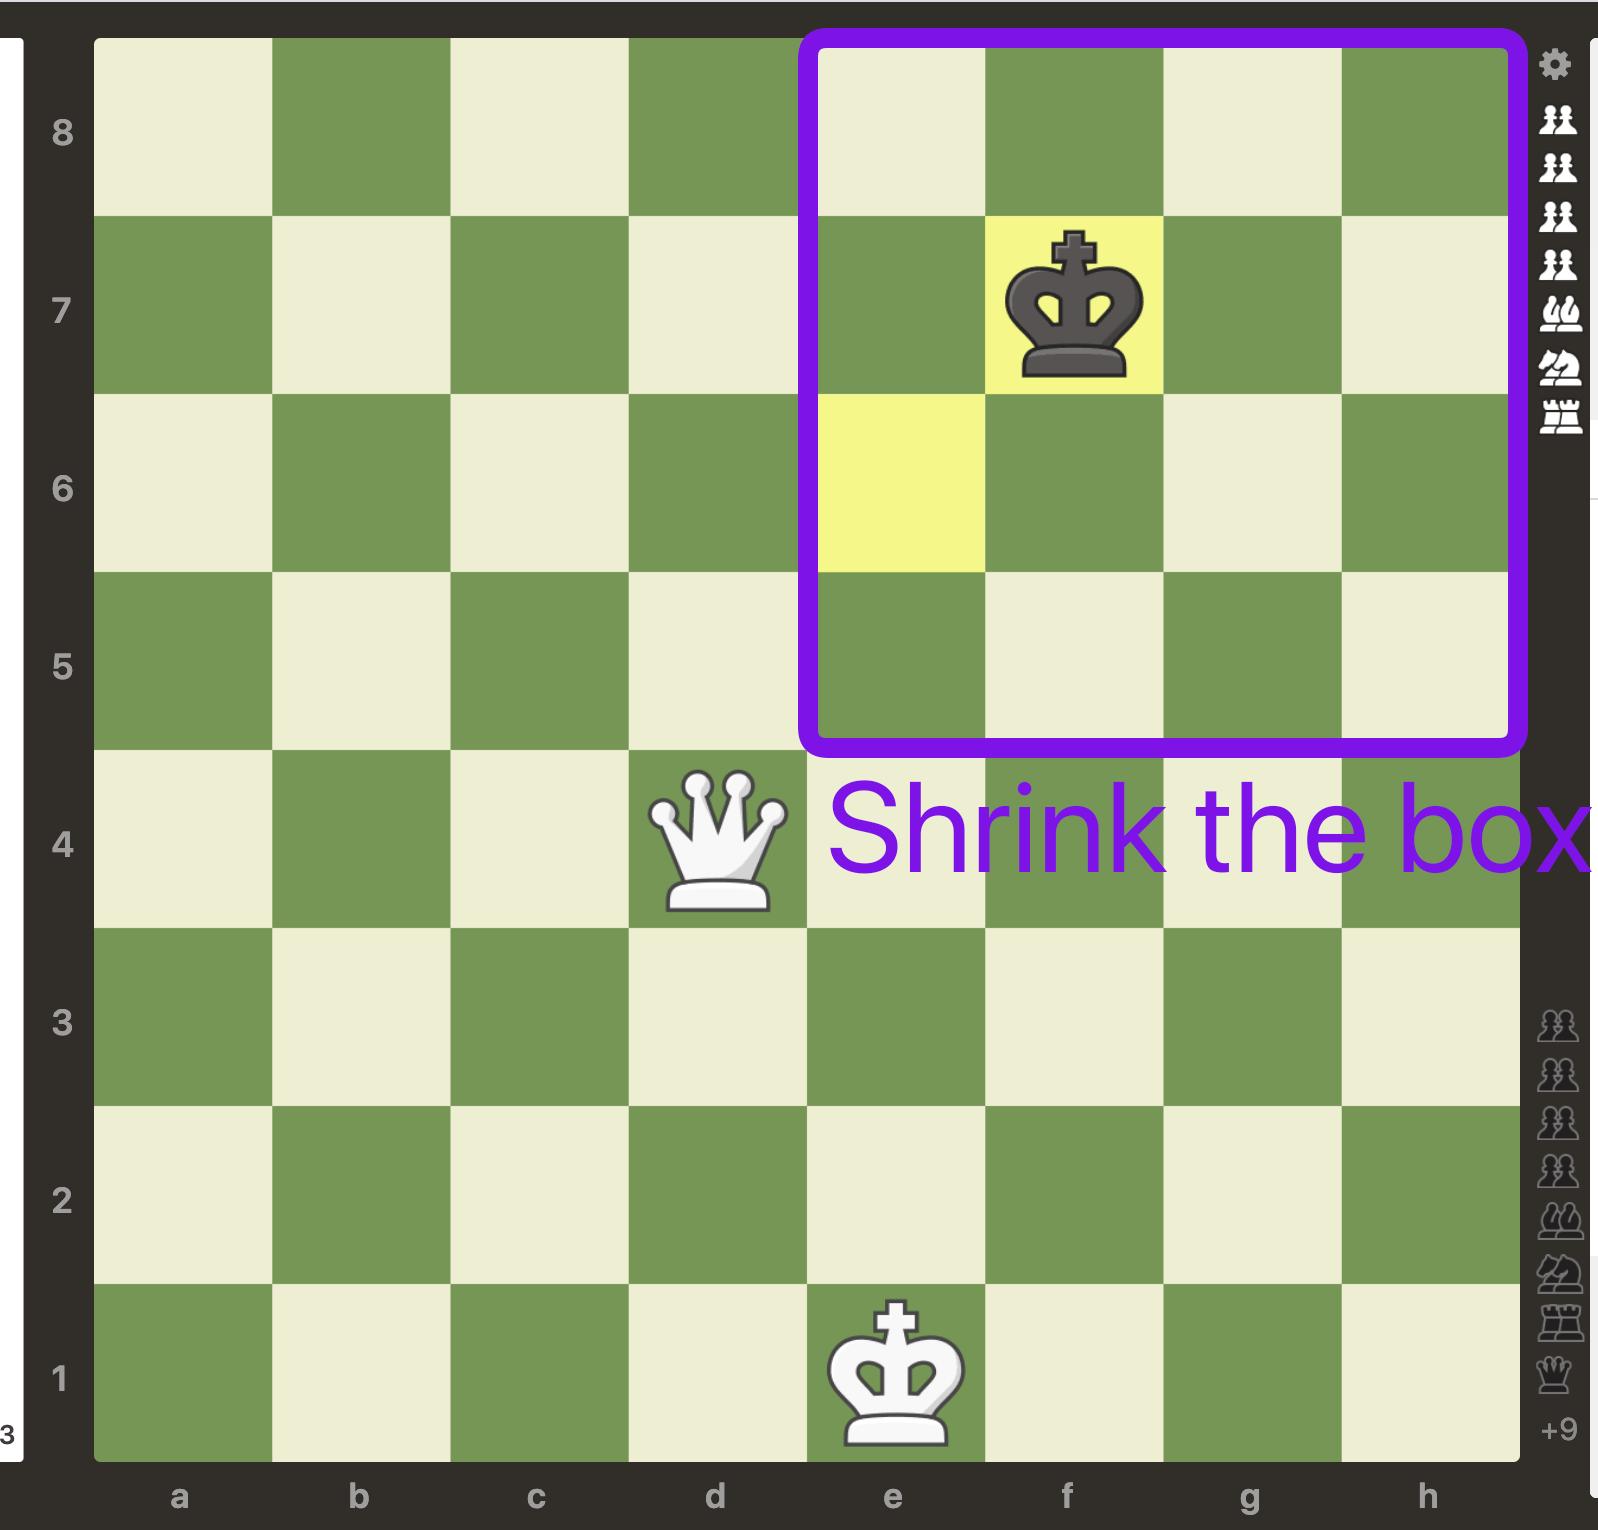 3.-Shrink-the-box